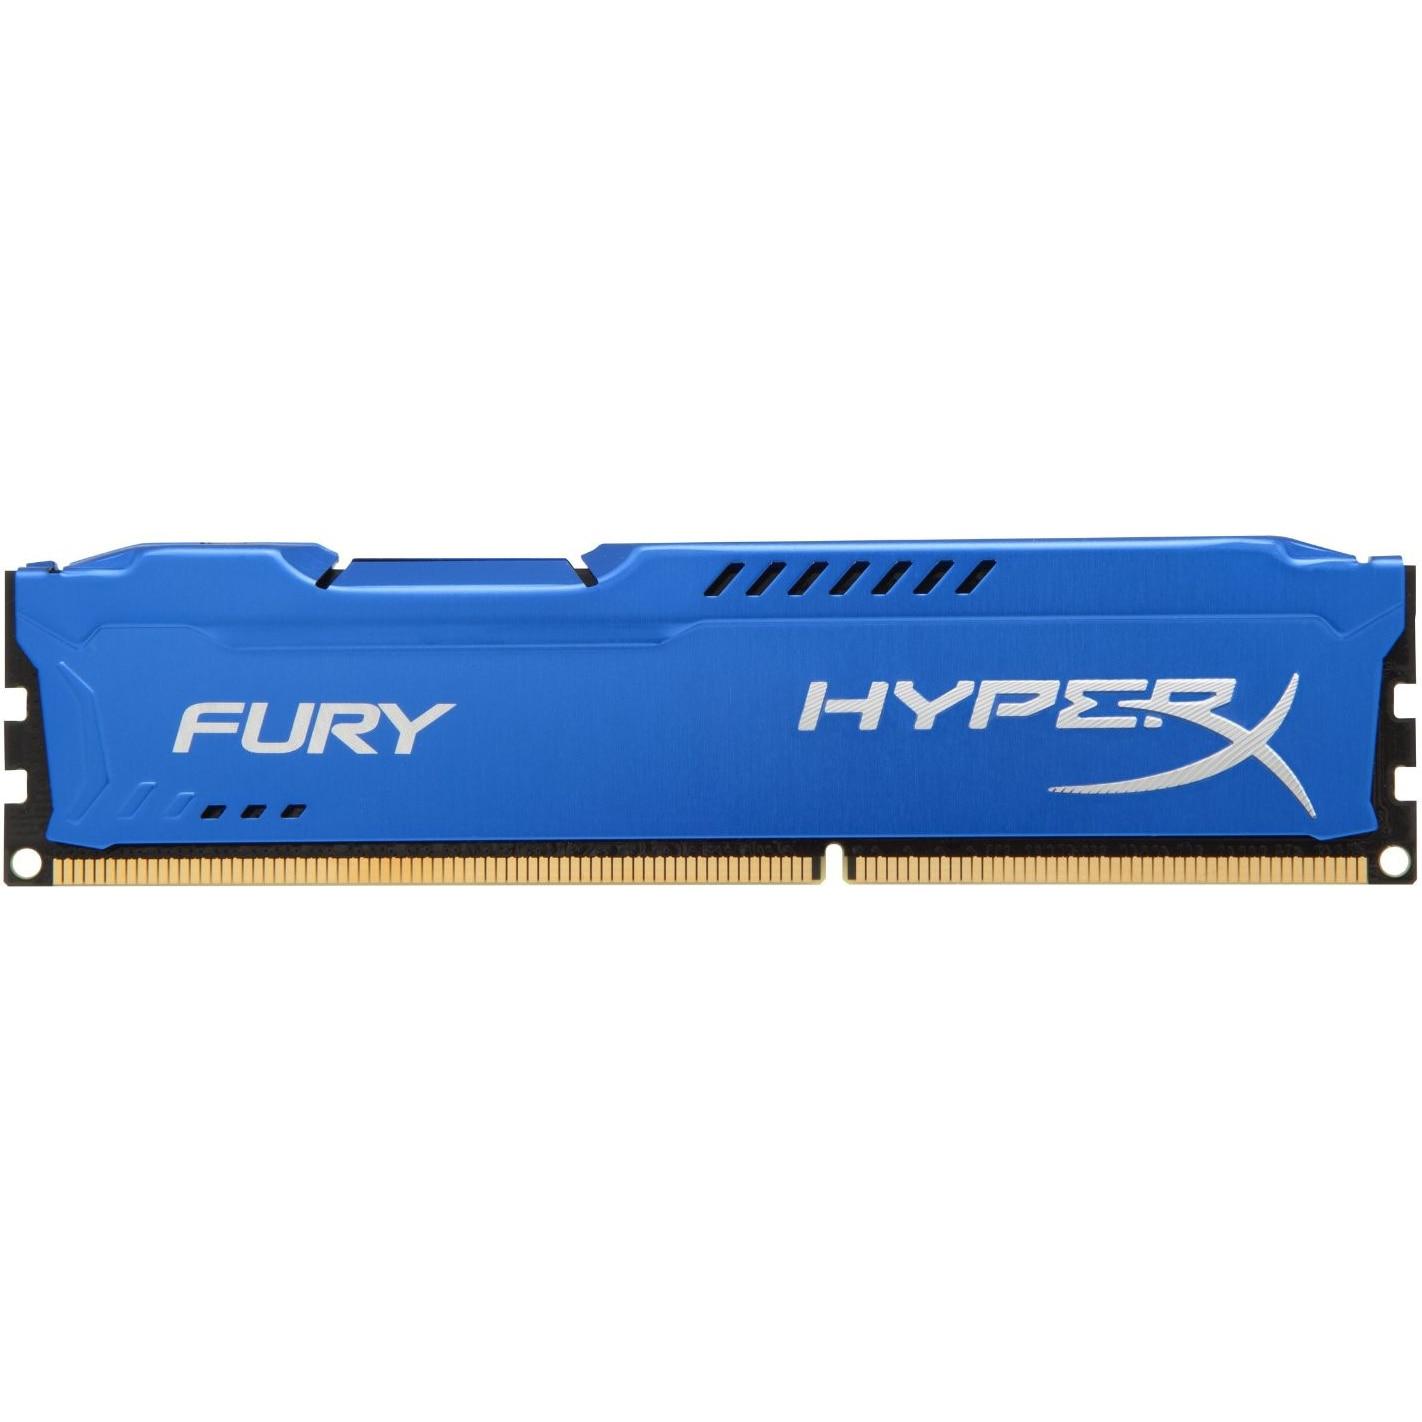 Fotografie Memorie HyperX FURY Blue 8GB, DDR3, 1600MHz, CL10, 1.5V